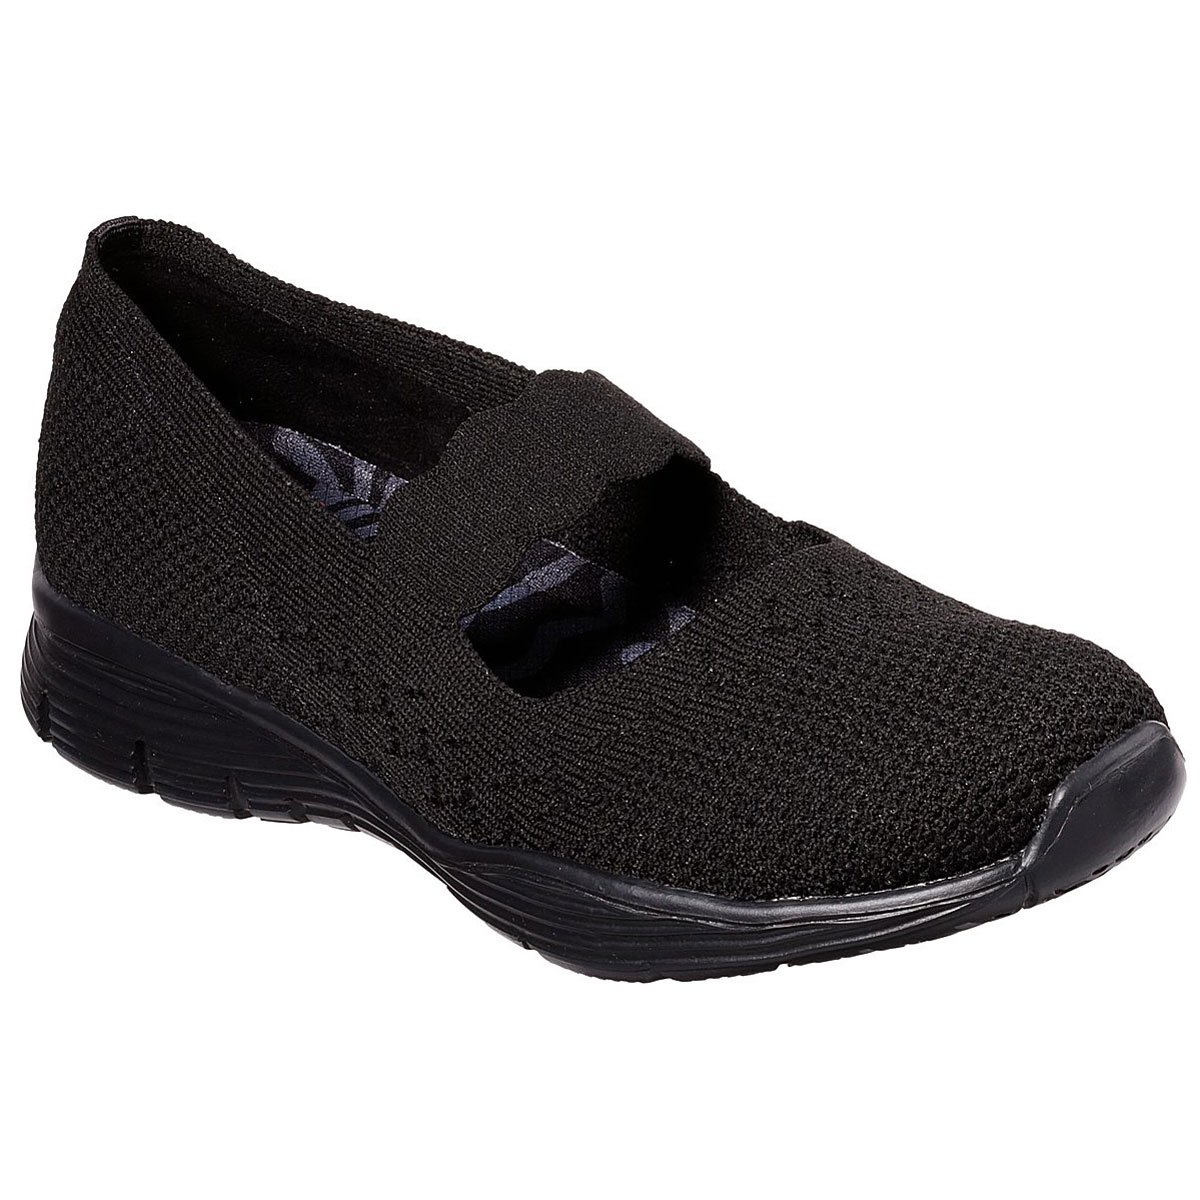 Skechers Women's Seager Power Hitter Shoes - Black, 8